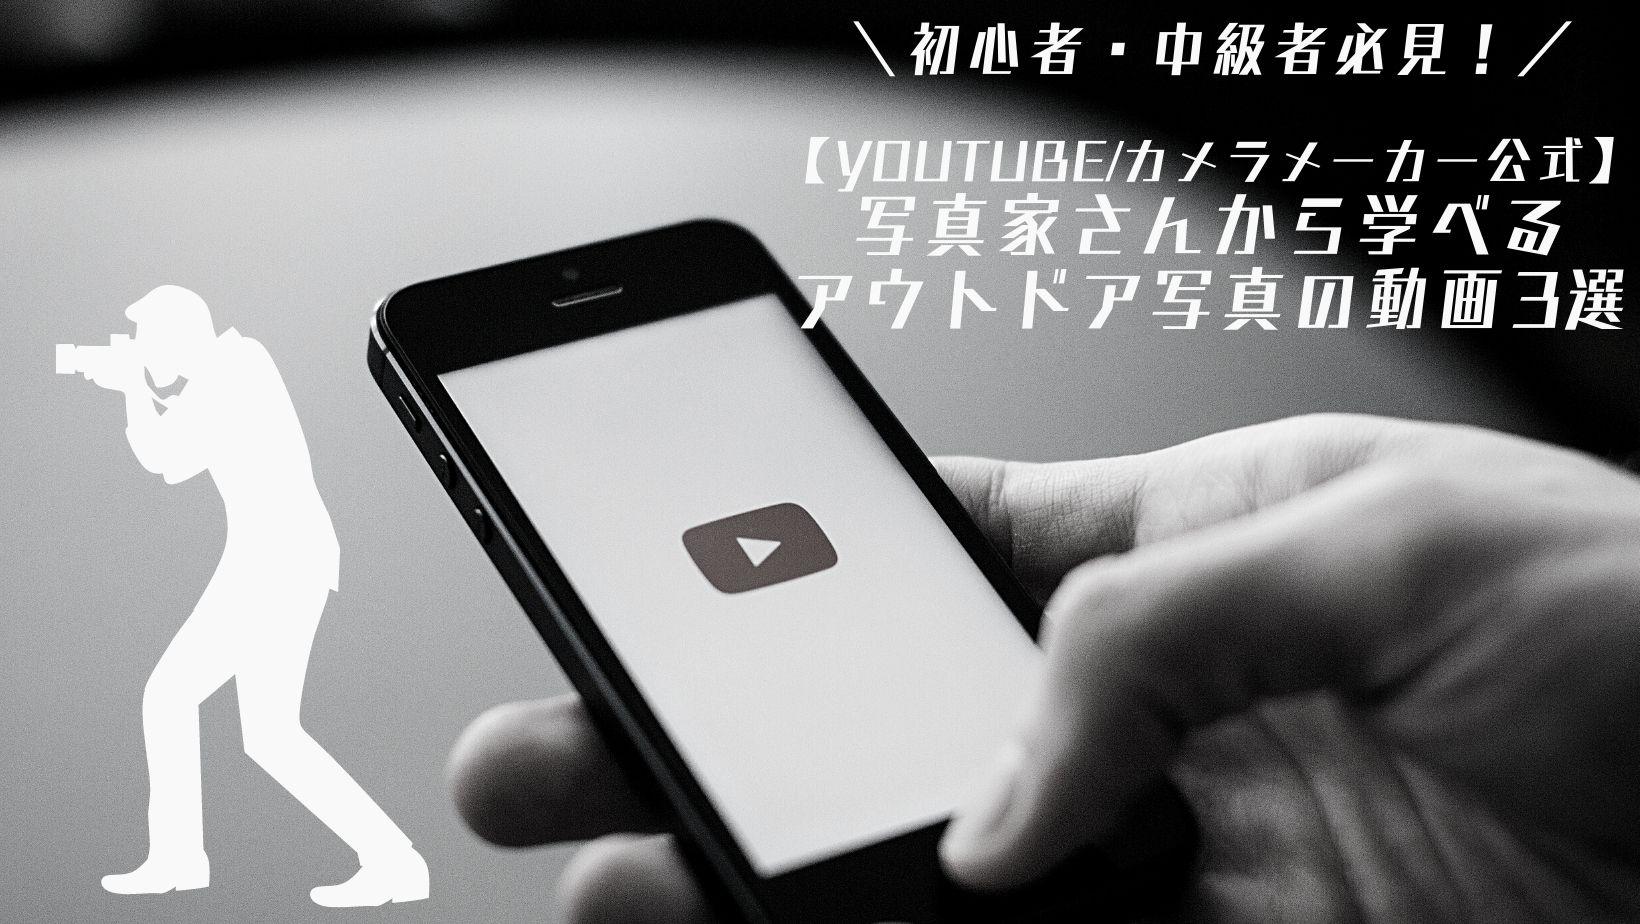 【YouTube/カメラメーカー公式】写真家さんから学べるアウトドア写真の動画3選